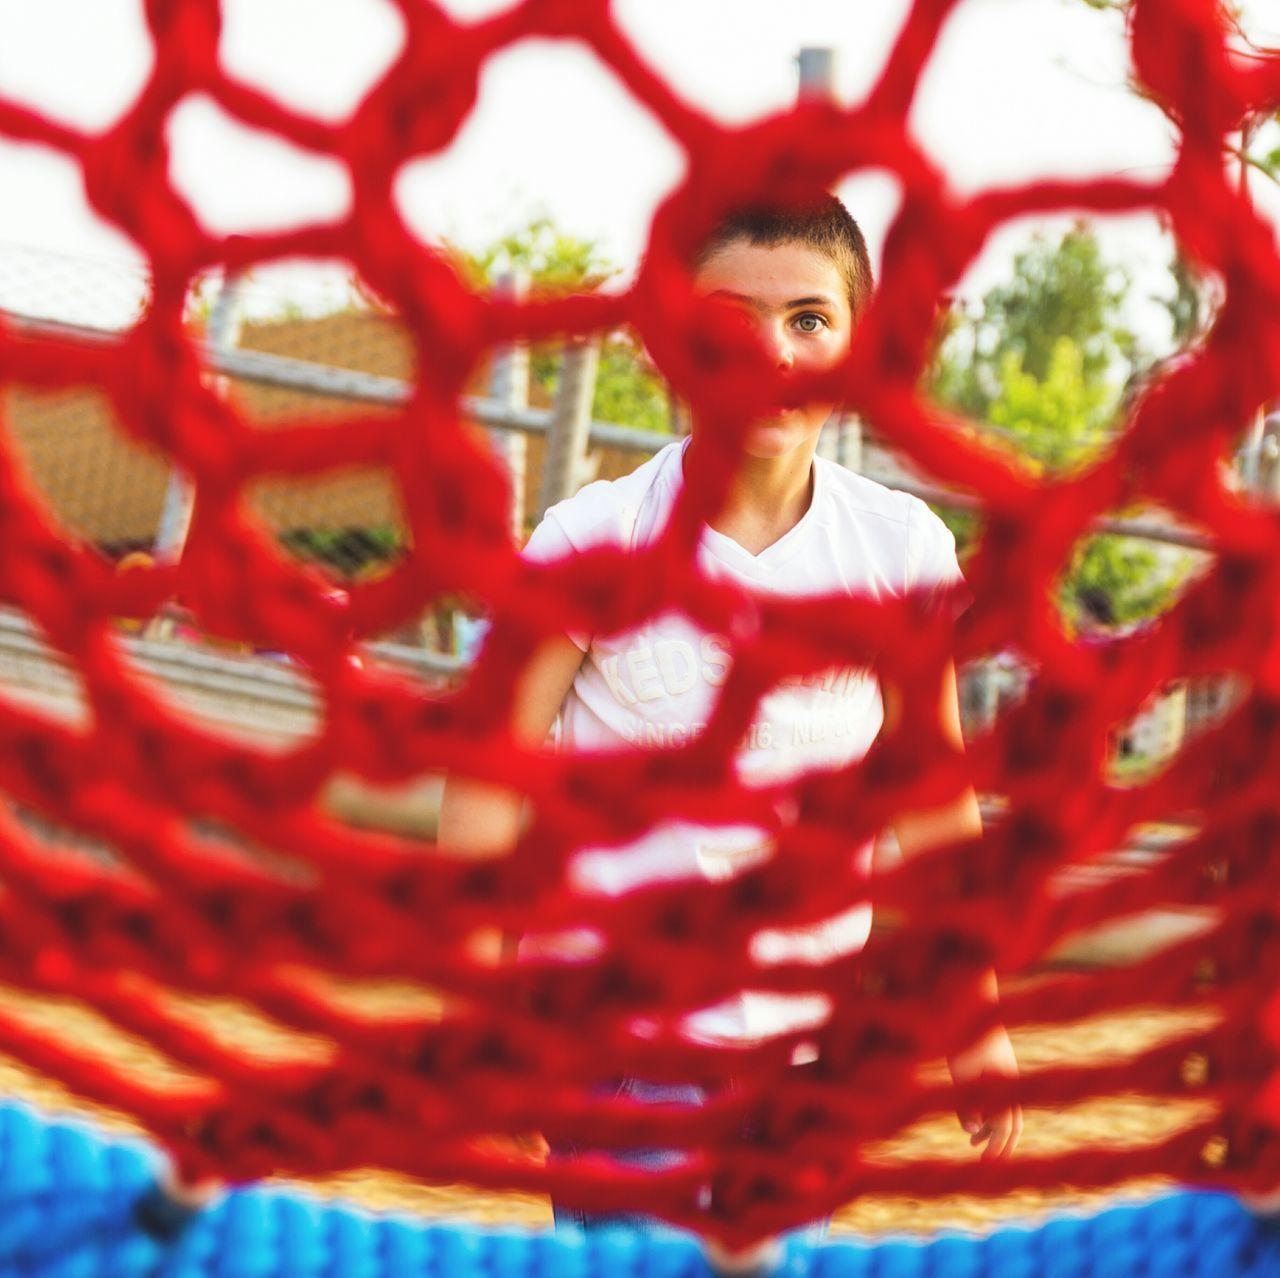 Boy Seen Through Jungle Gym At Playground